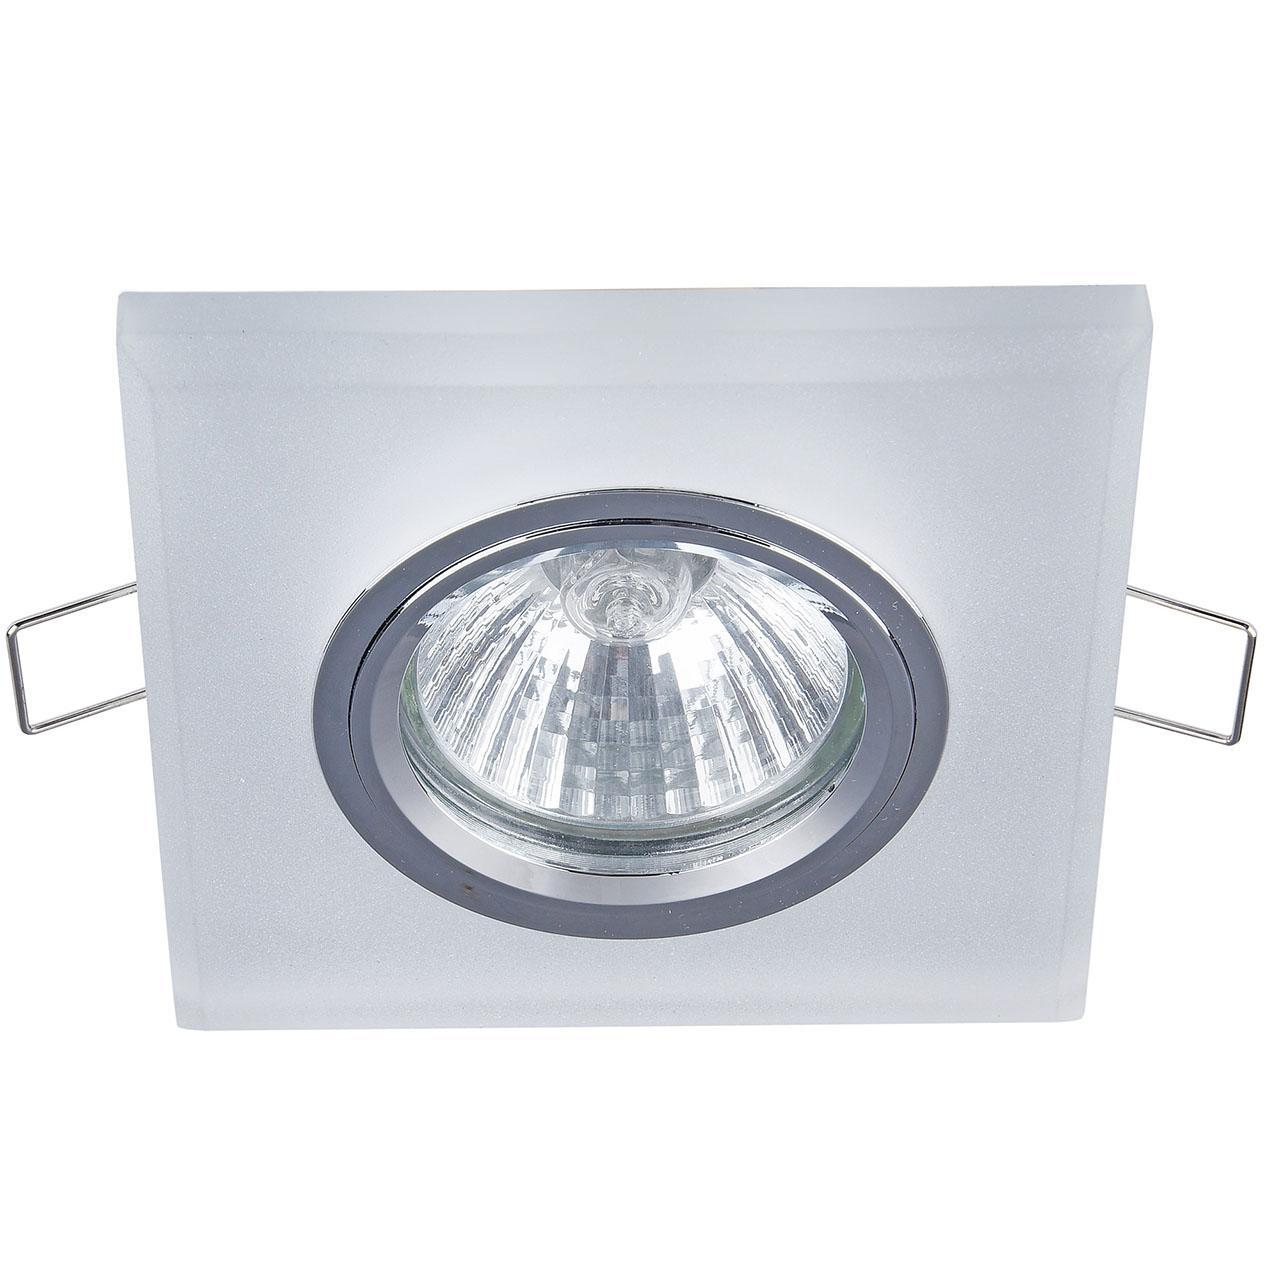 Фото - Встраиваемый светильник Maytoni Metal DL292-2-3W-W 7000k 3w 200 lumen white 3 led streetlight emitter metal strip w optical lens 9 11v